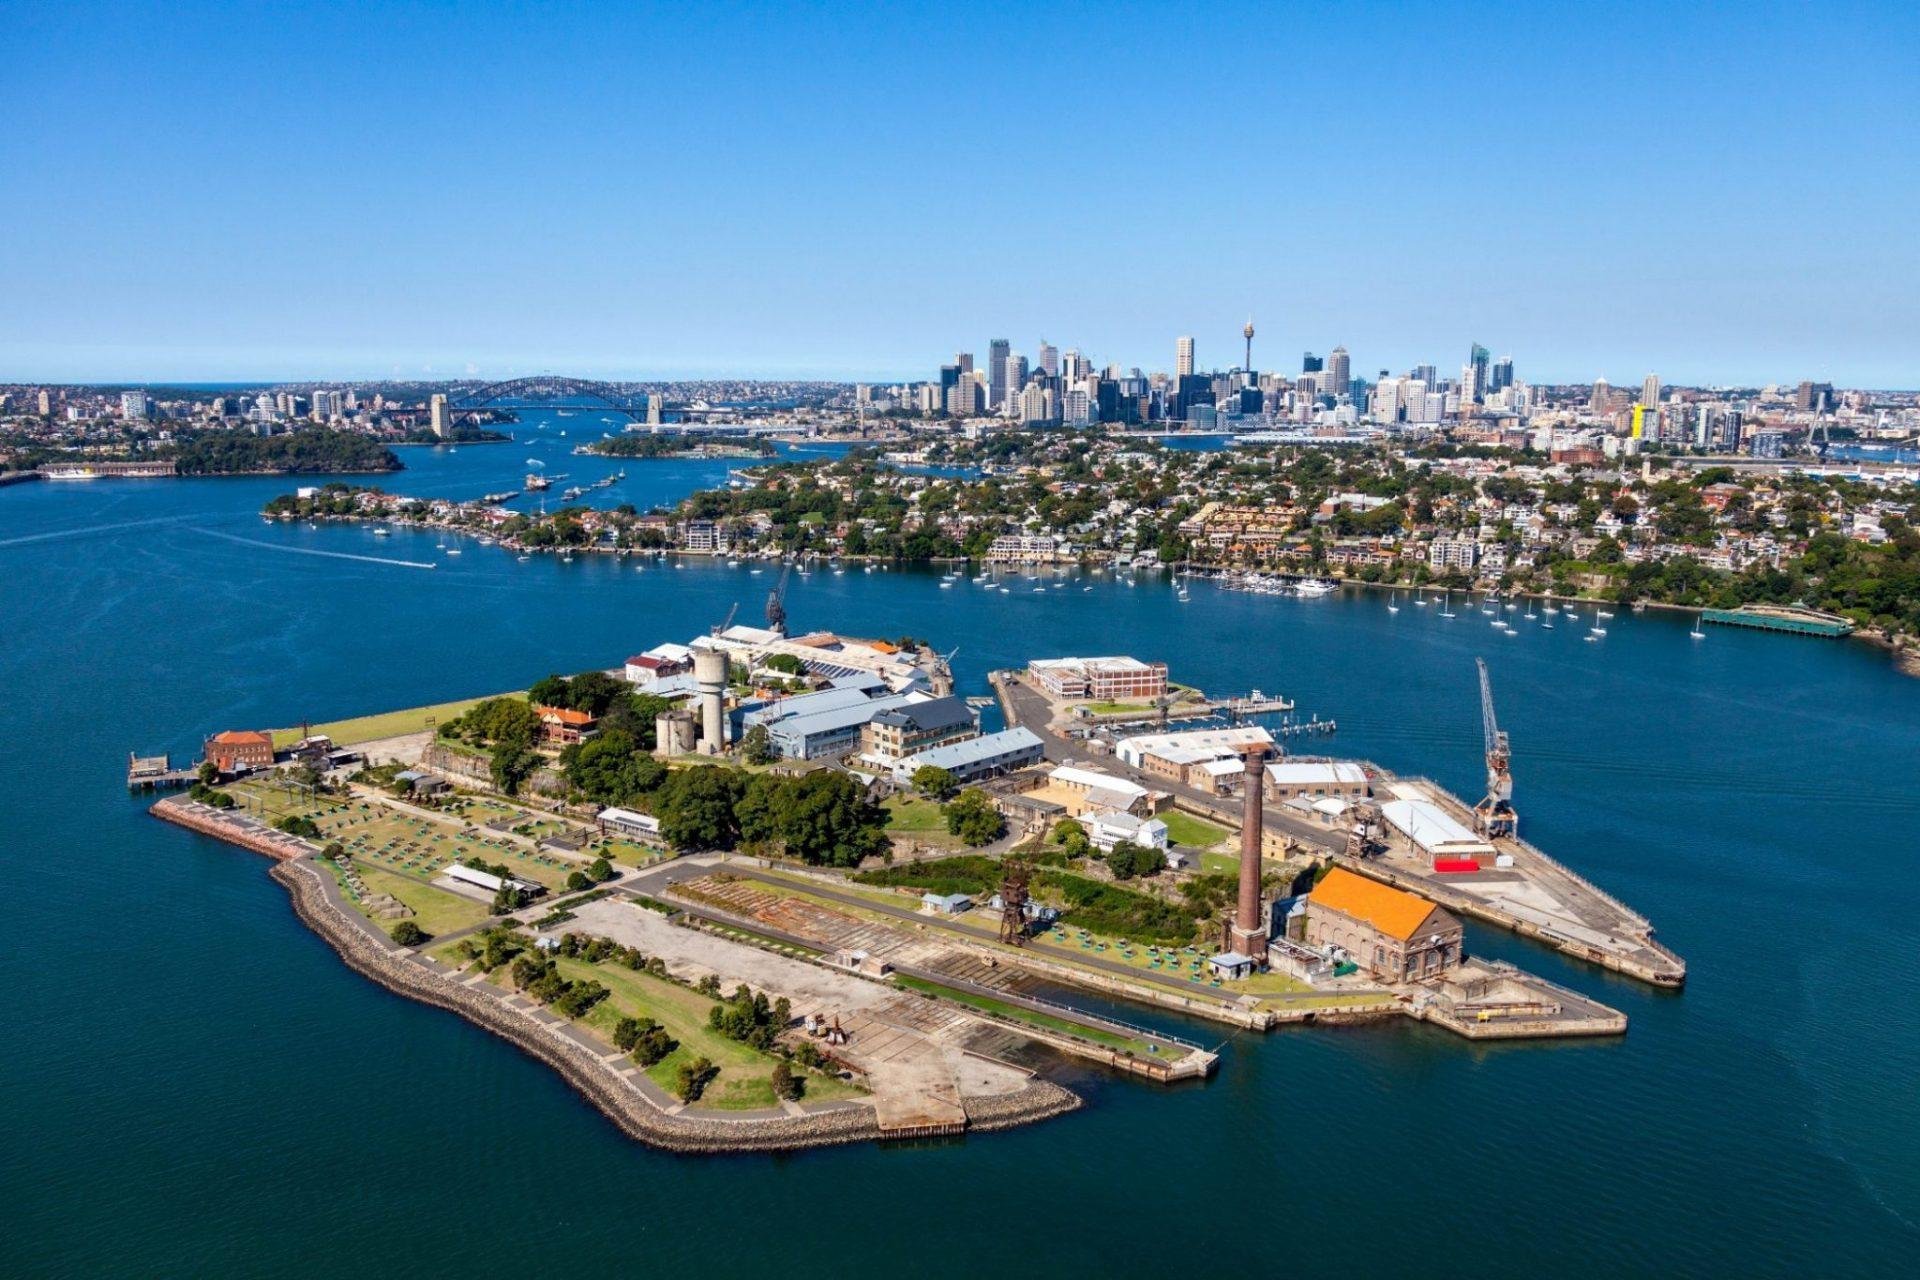 THIS ISLAND LIFE | Summer on Cockatoo Island in Sydney